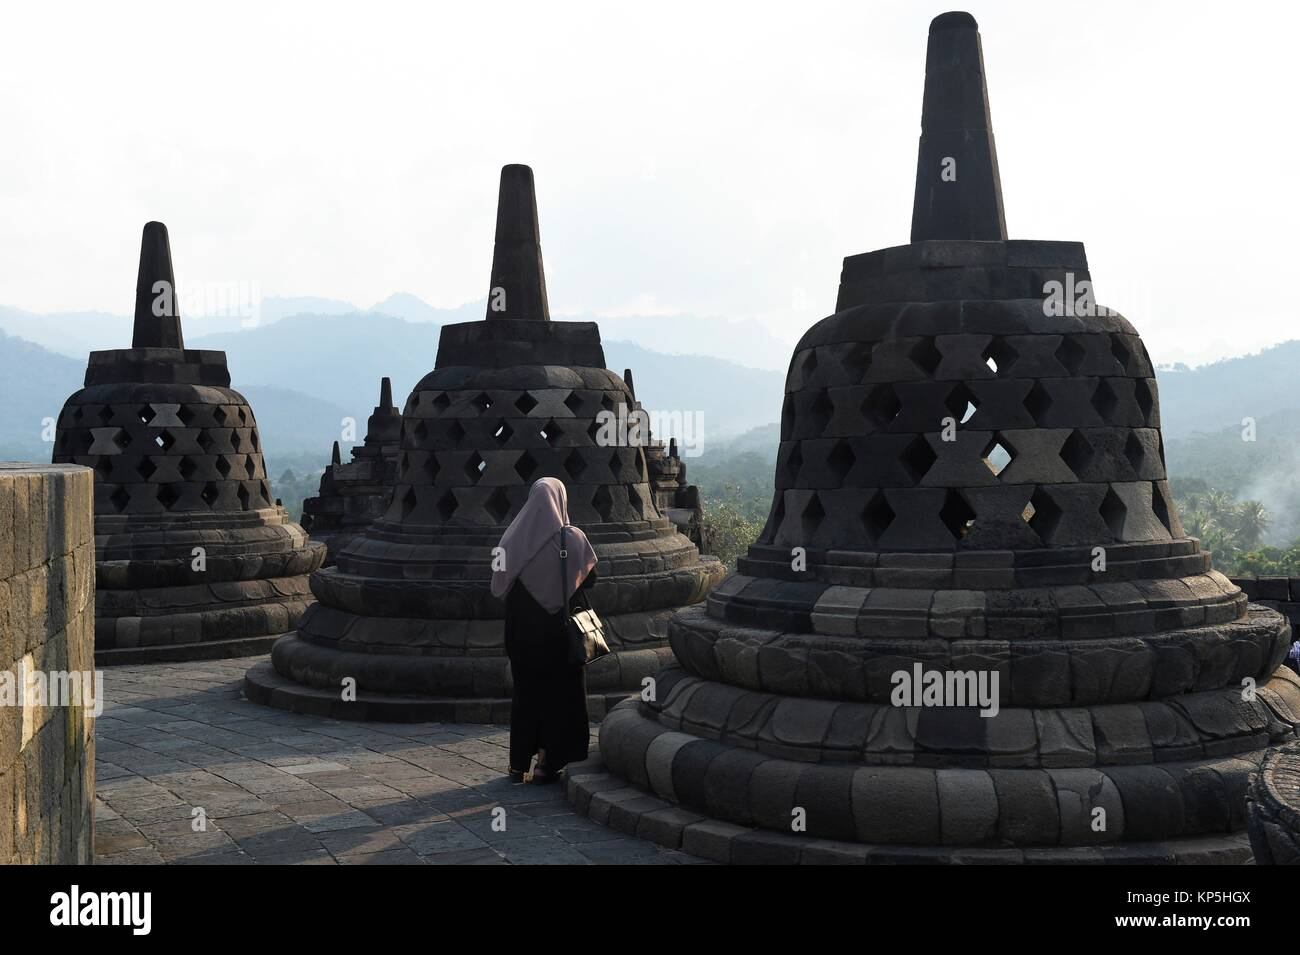 Borobudur buddhist temple,Central Java,Indonesia. - Stock Image